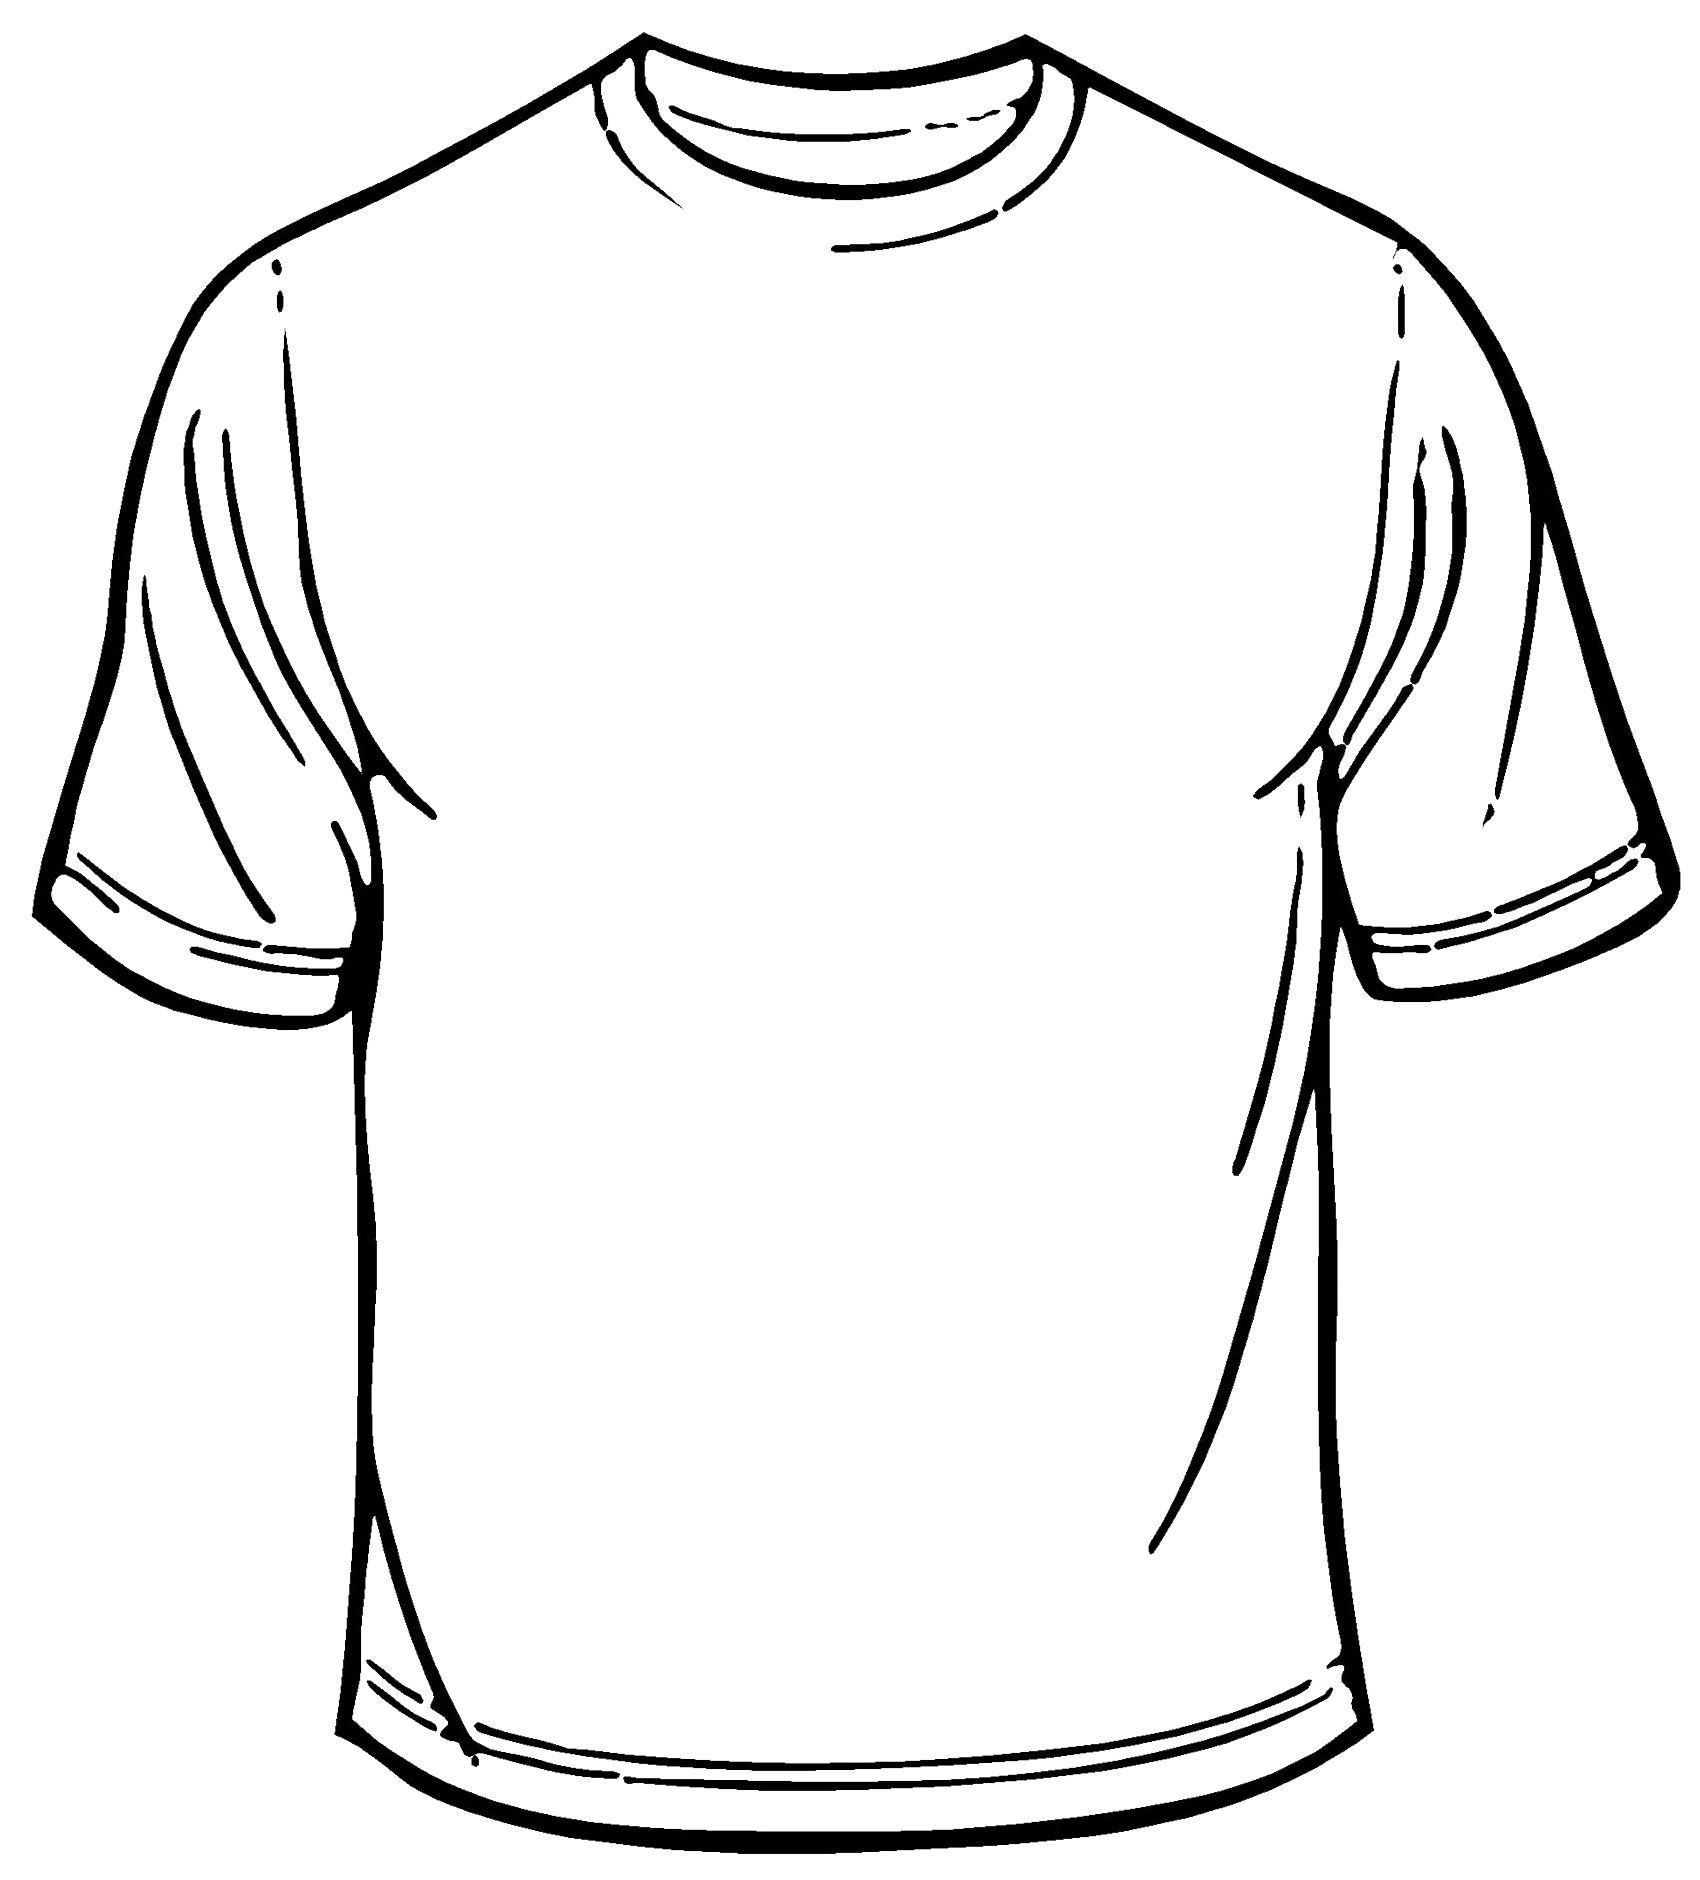 T Shirt Outline Clipart Clipart Best Clipart Best T Shirt Design Template Shirt Template Fashion Design Template